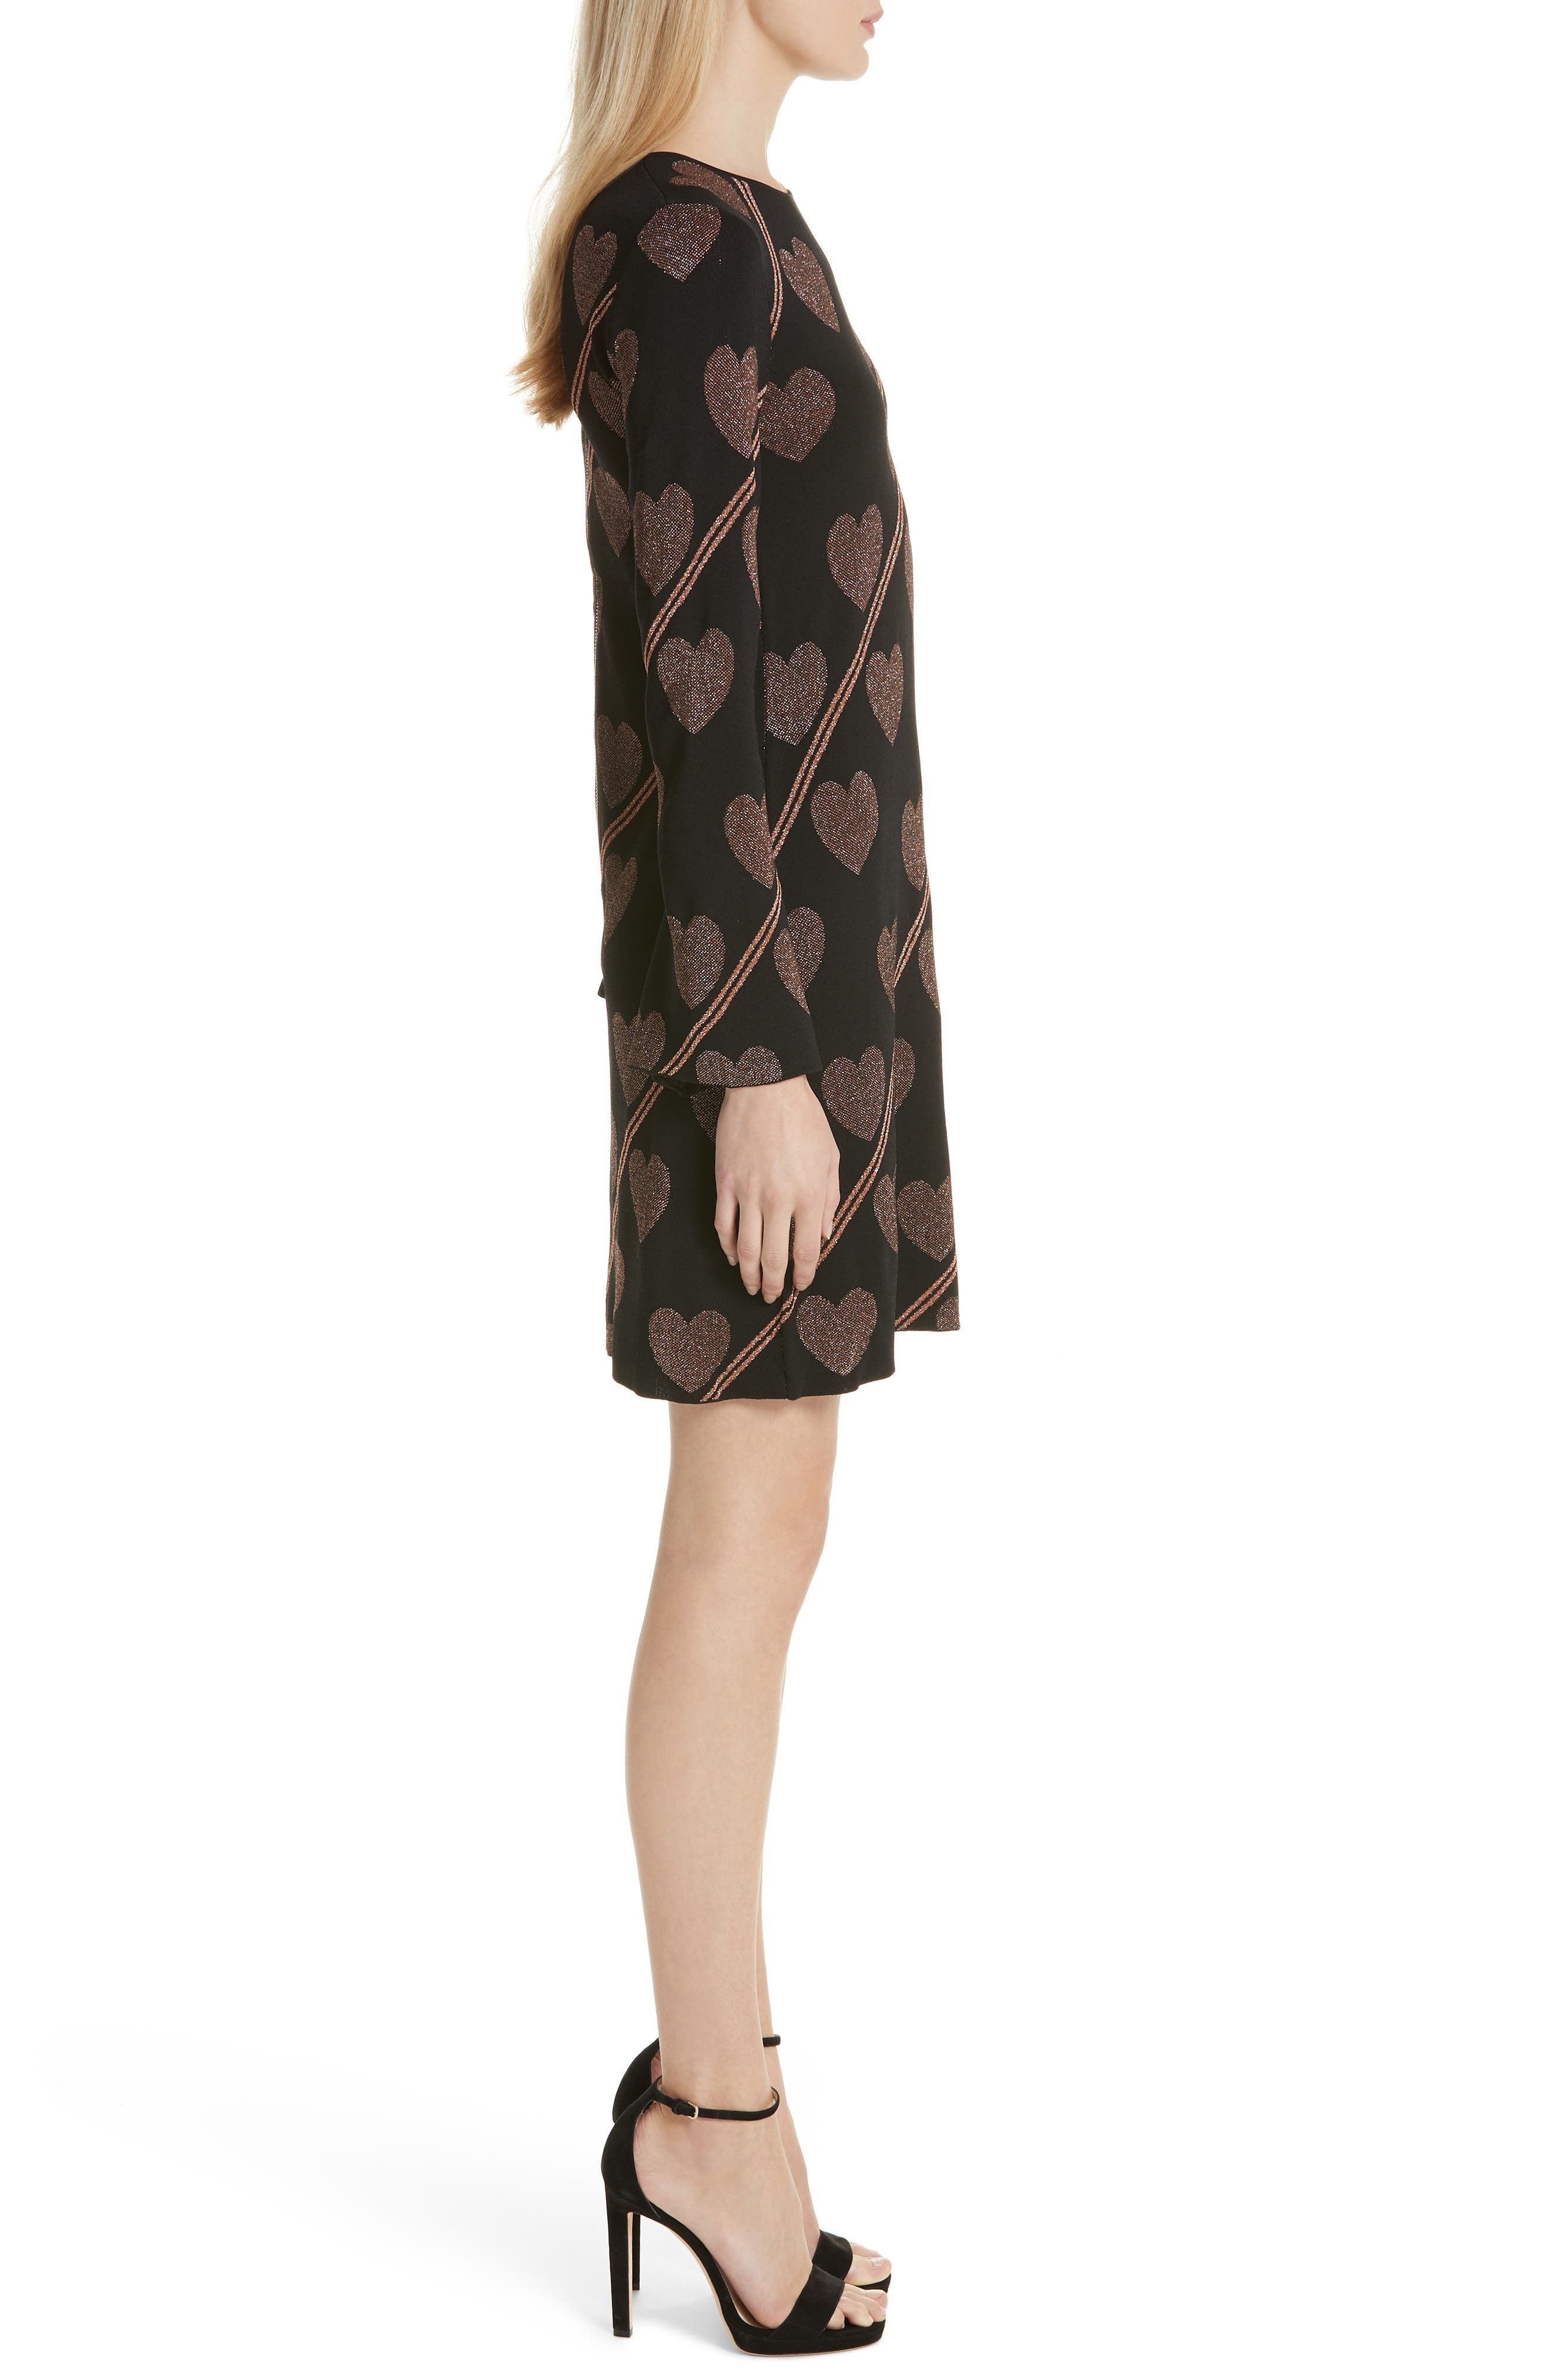 Uzeniaa Joyous Sweater Dress,                             Alternate thumbnail 3, color,                             BLACK